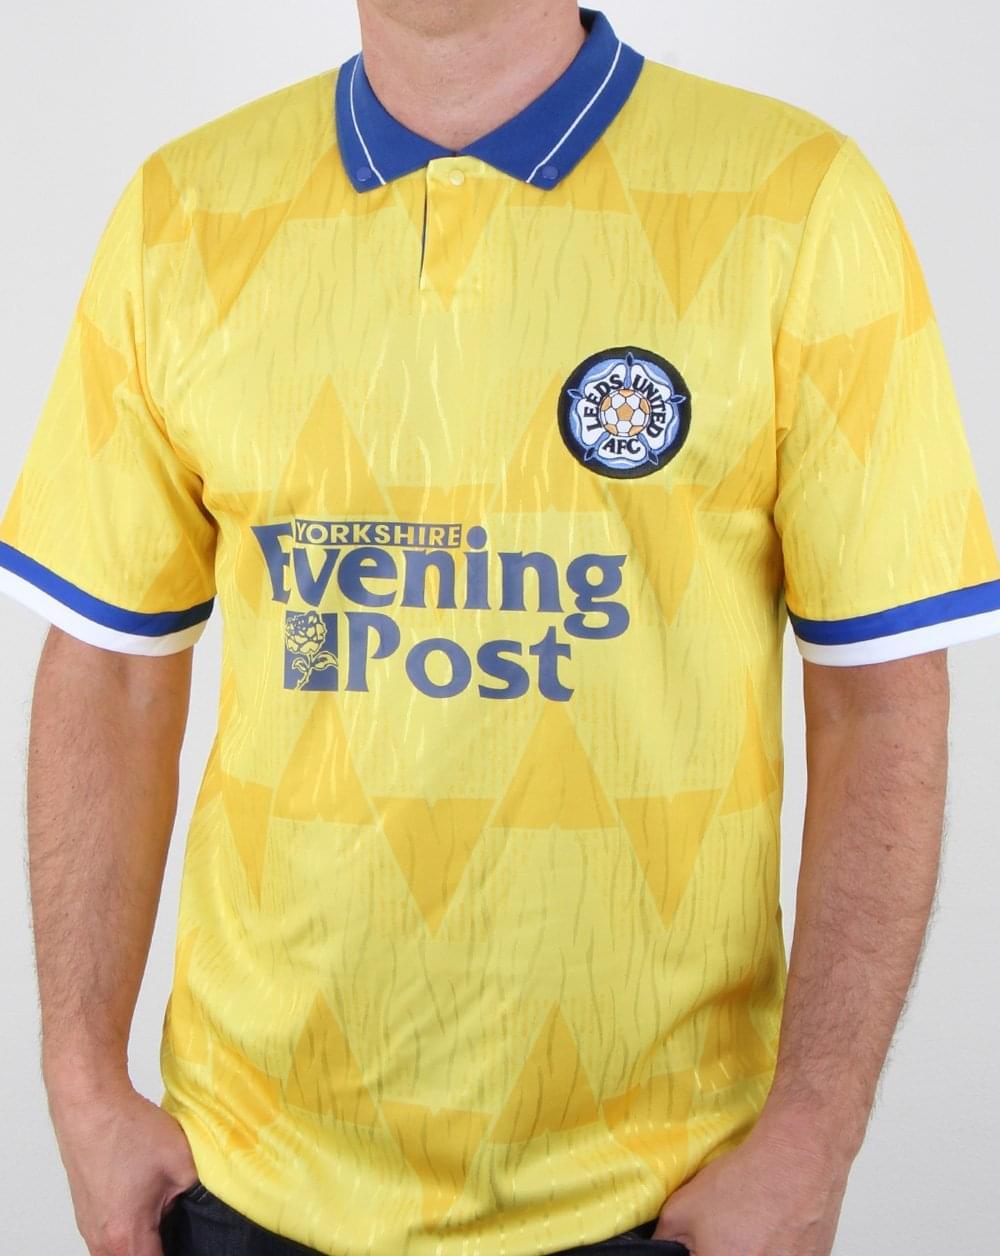 80s Casual Classics 80s Casual Classics Leeds 1992 Away Retro Shirt Yellow 32f227a05